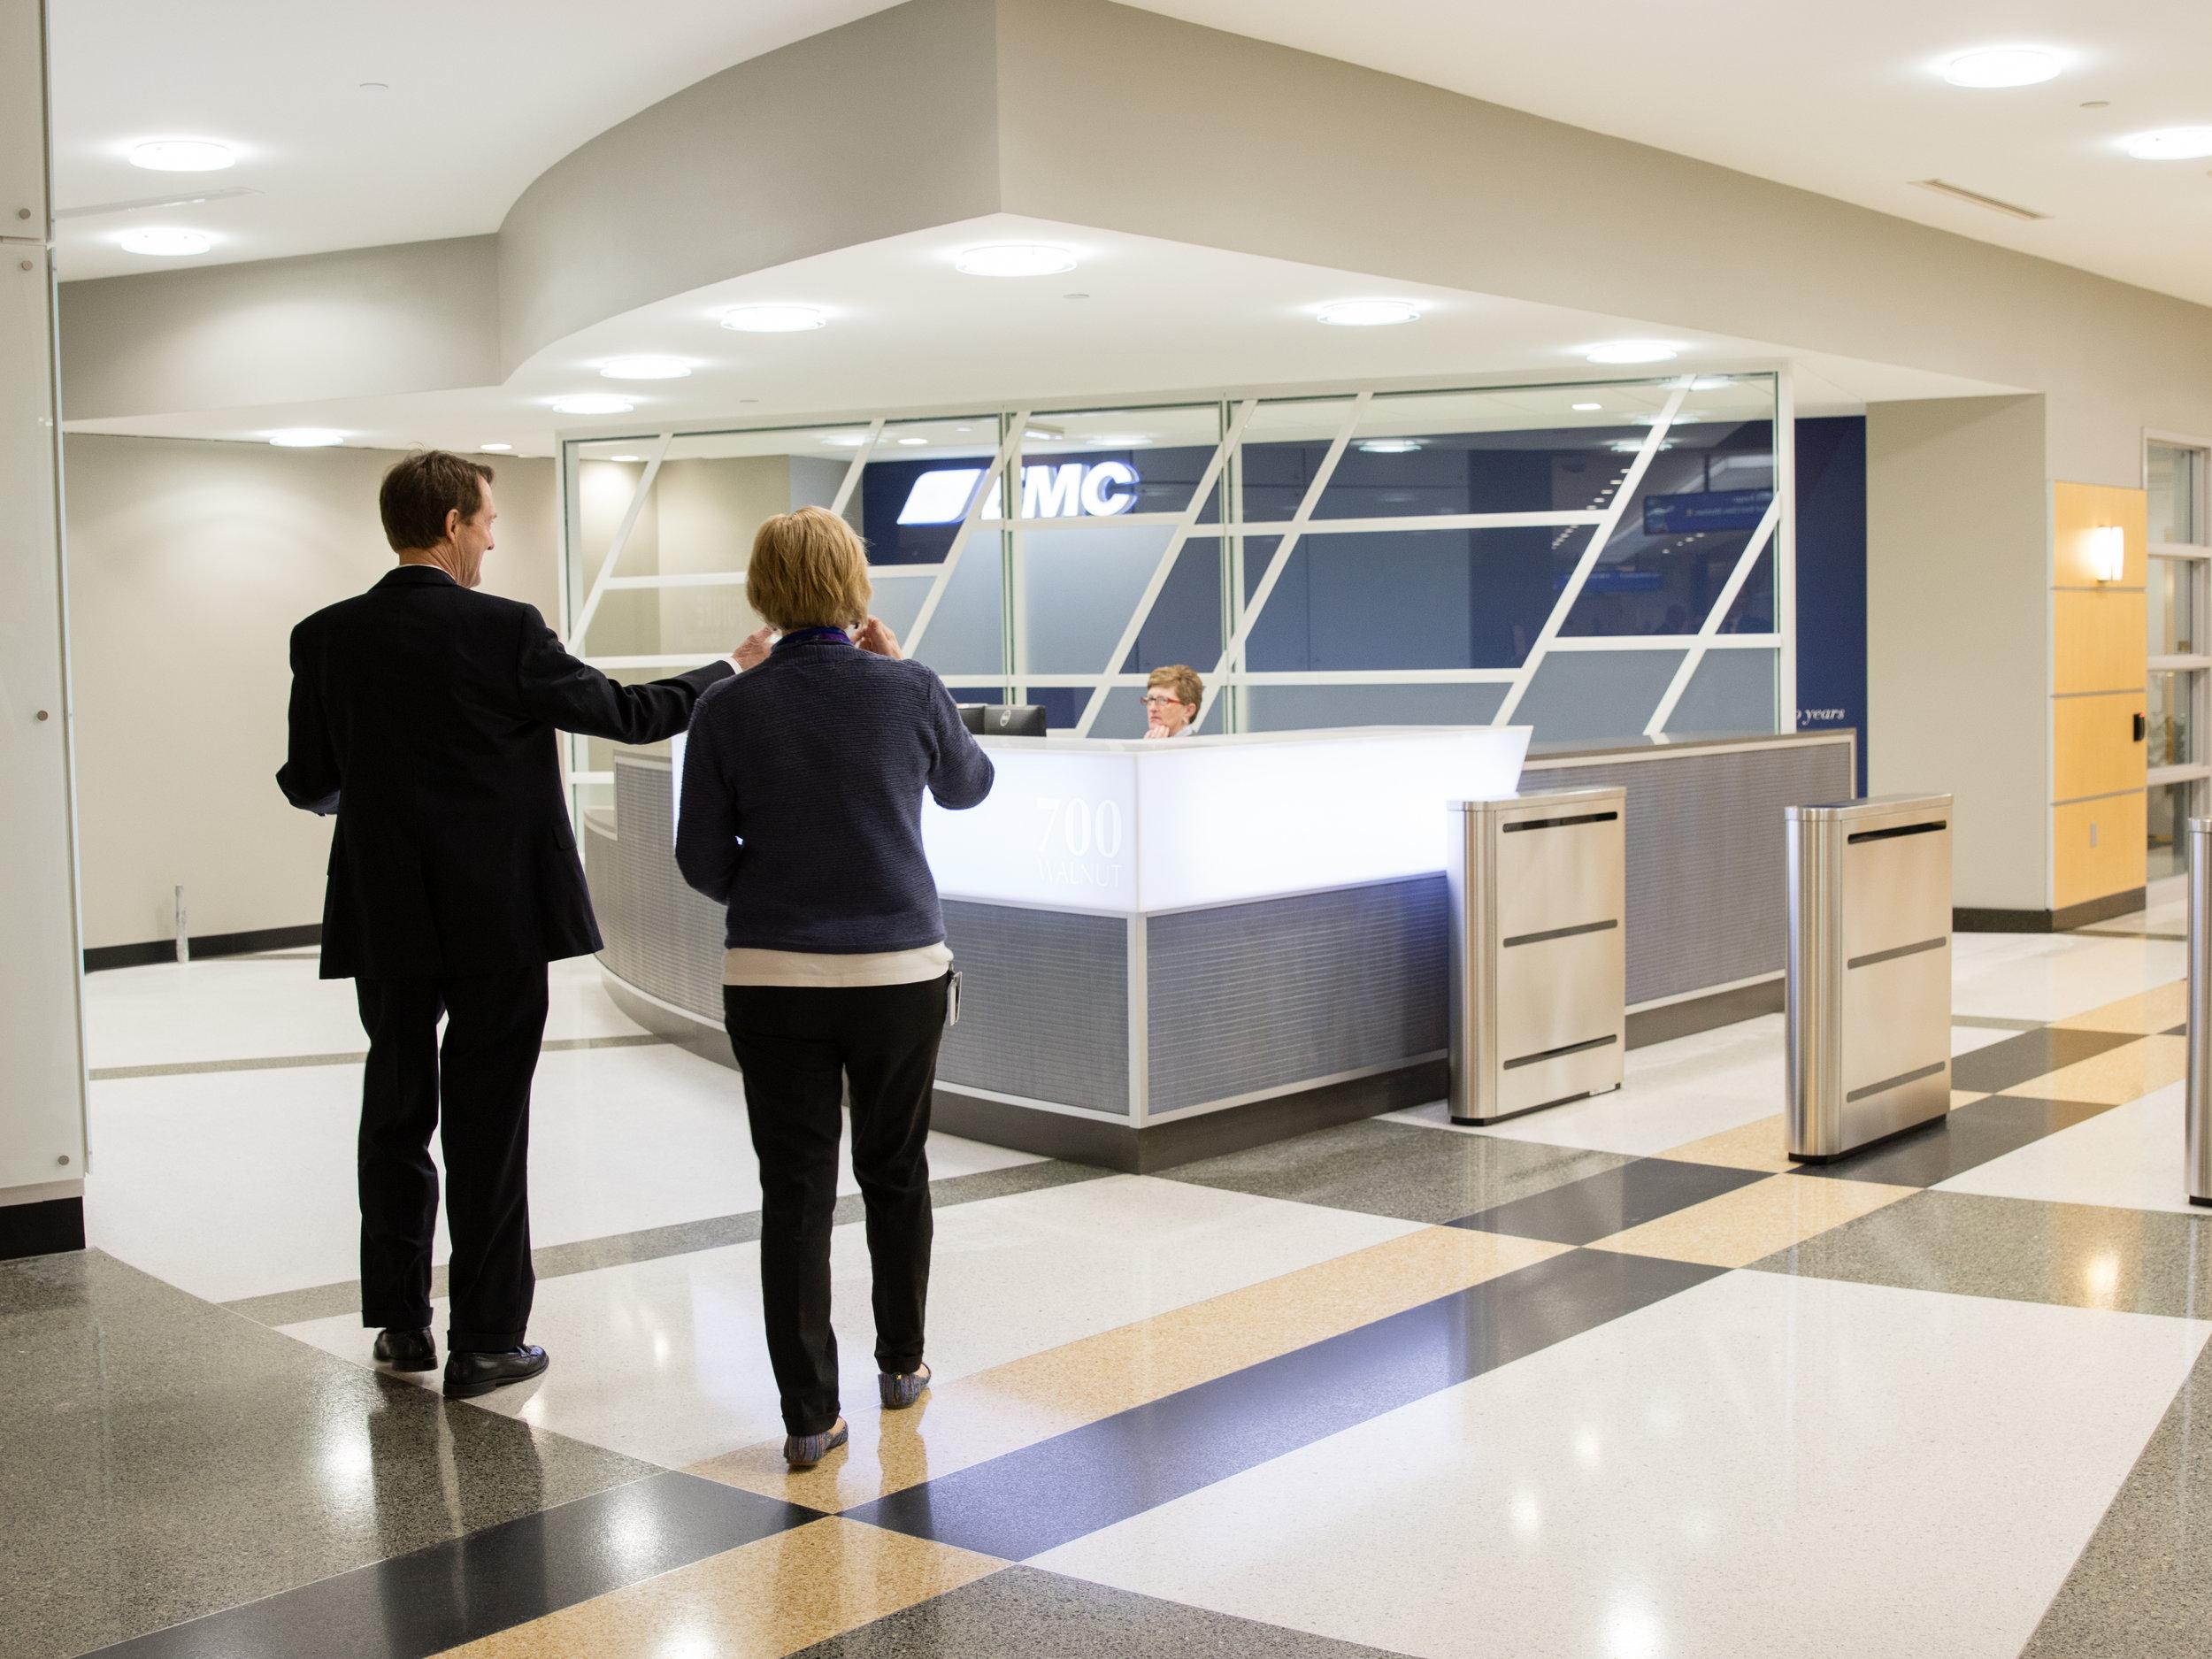 EMC's new skywalk reception area